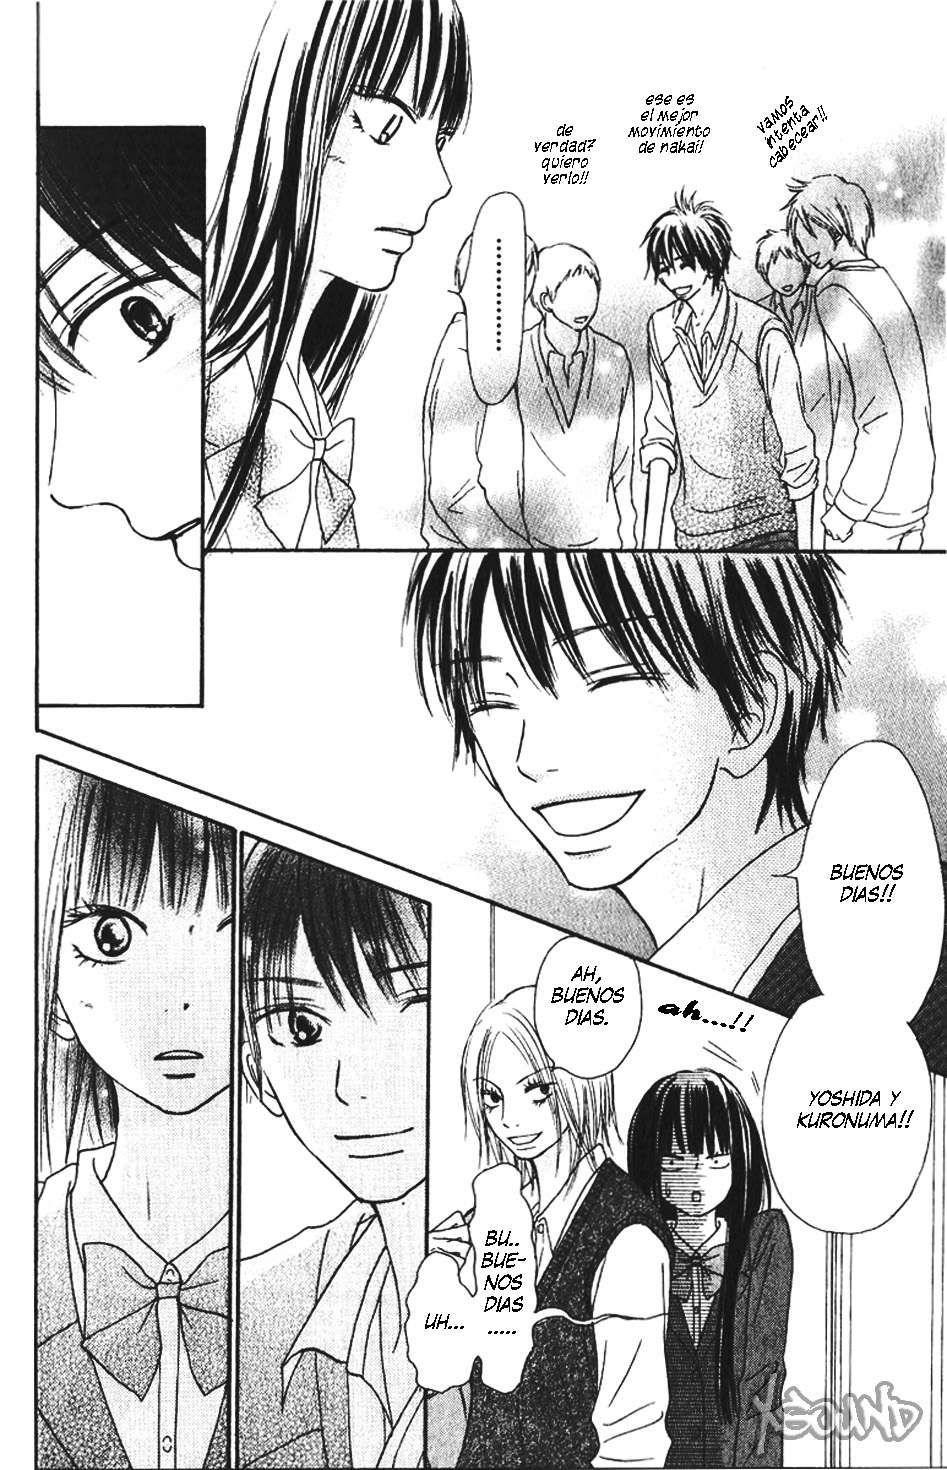 Manga Kimi Ni Todoke cápitulo 30 página KnTeKnT046.jpg